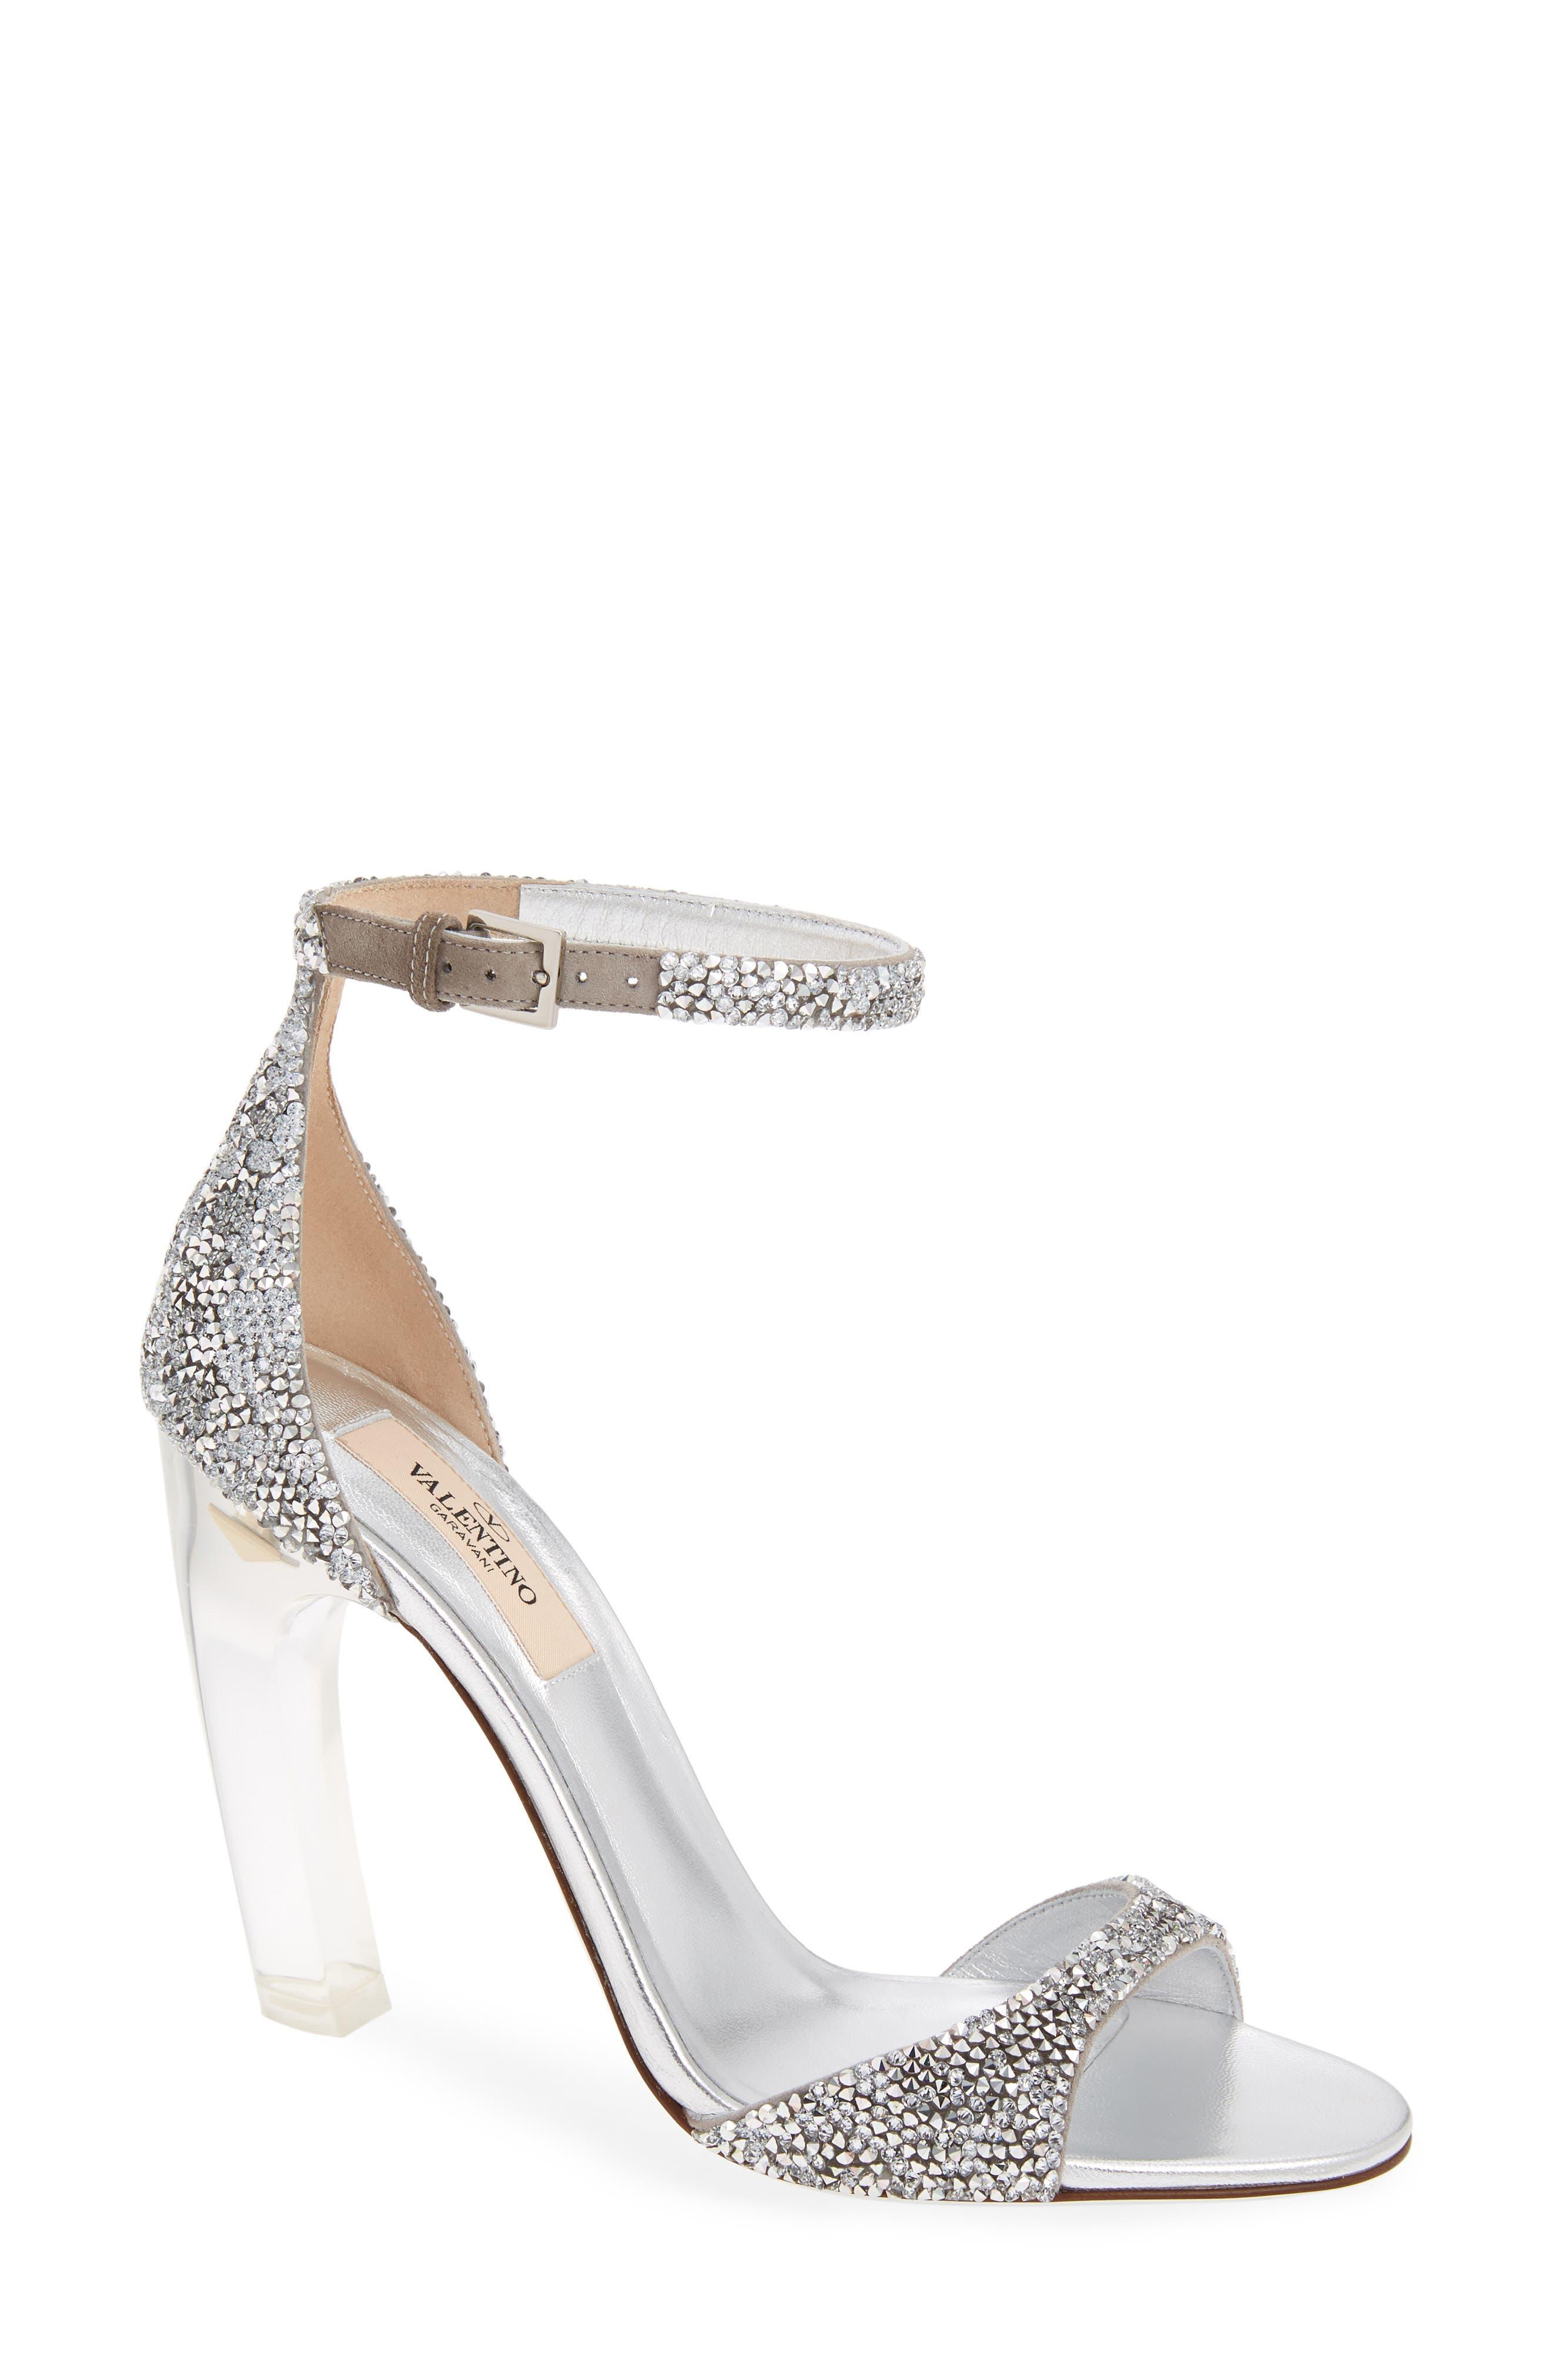 VALENTINO GARAVANI Crystal Embellished Clear Heel Sandal (Women)